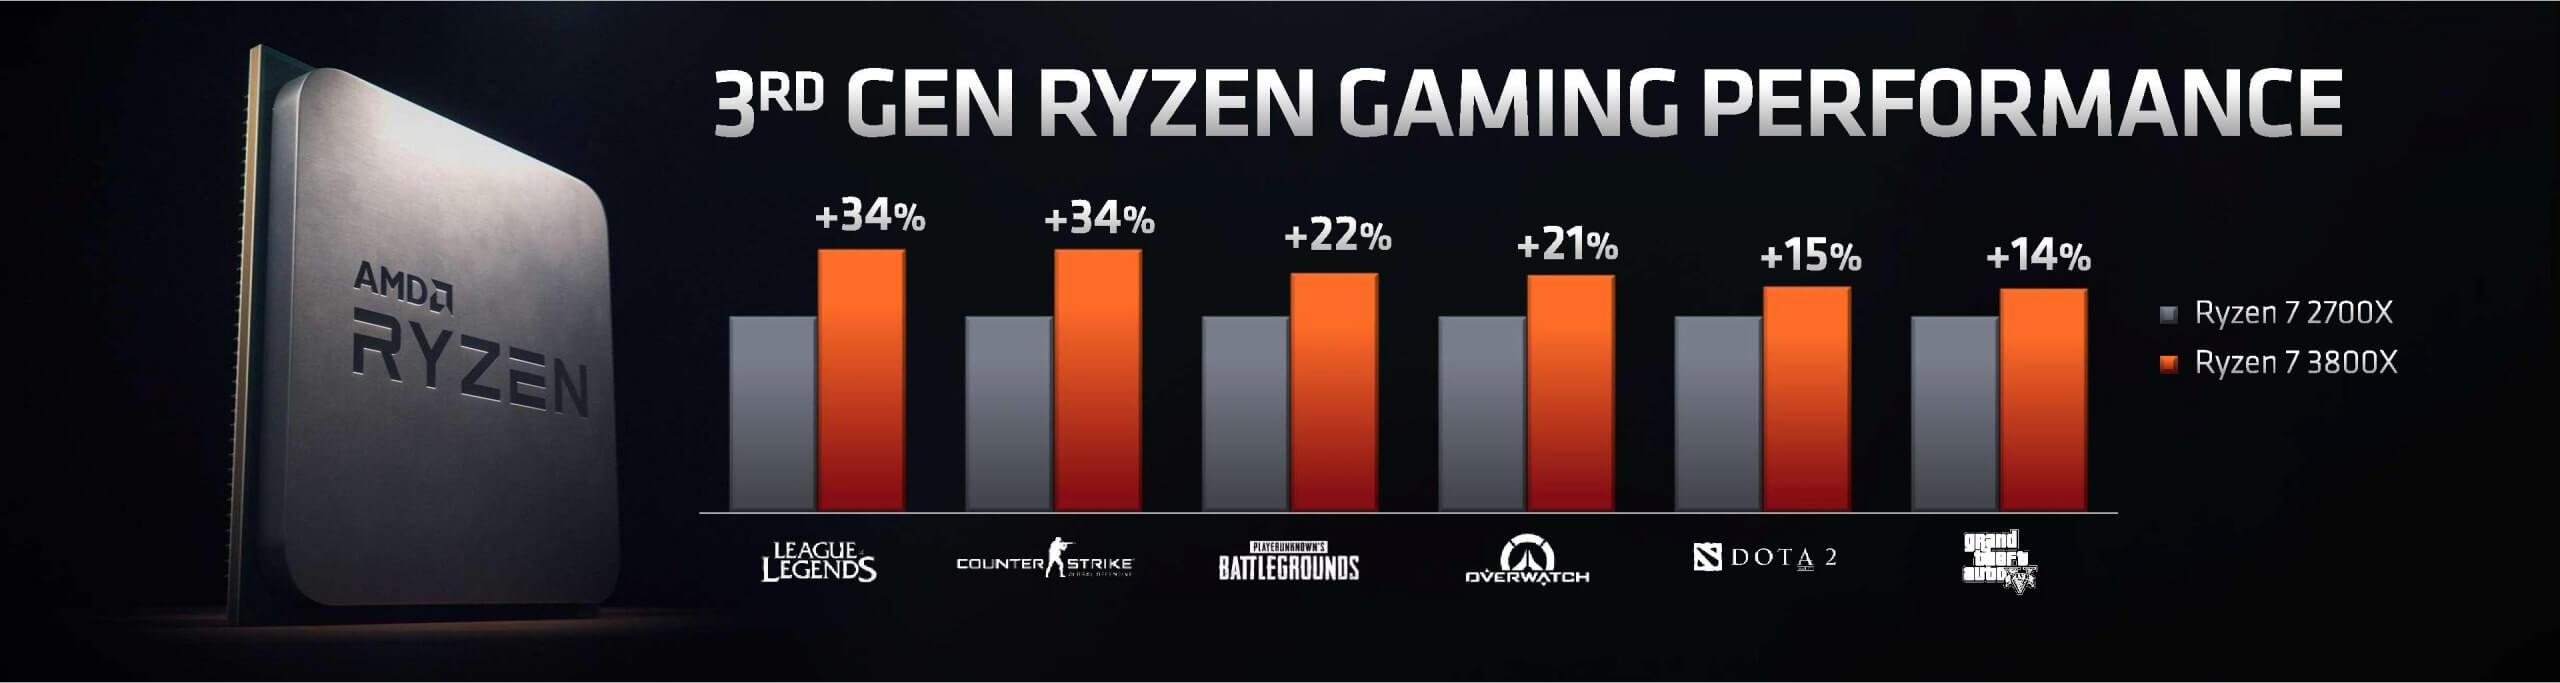 AMD announces Ryzen 9 3900X flagship desktop CPU, Ryzen 7 3800X